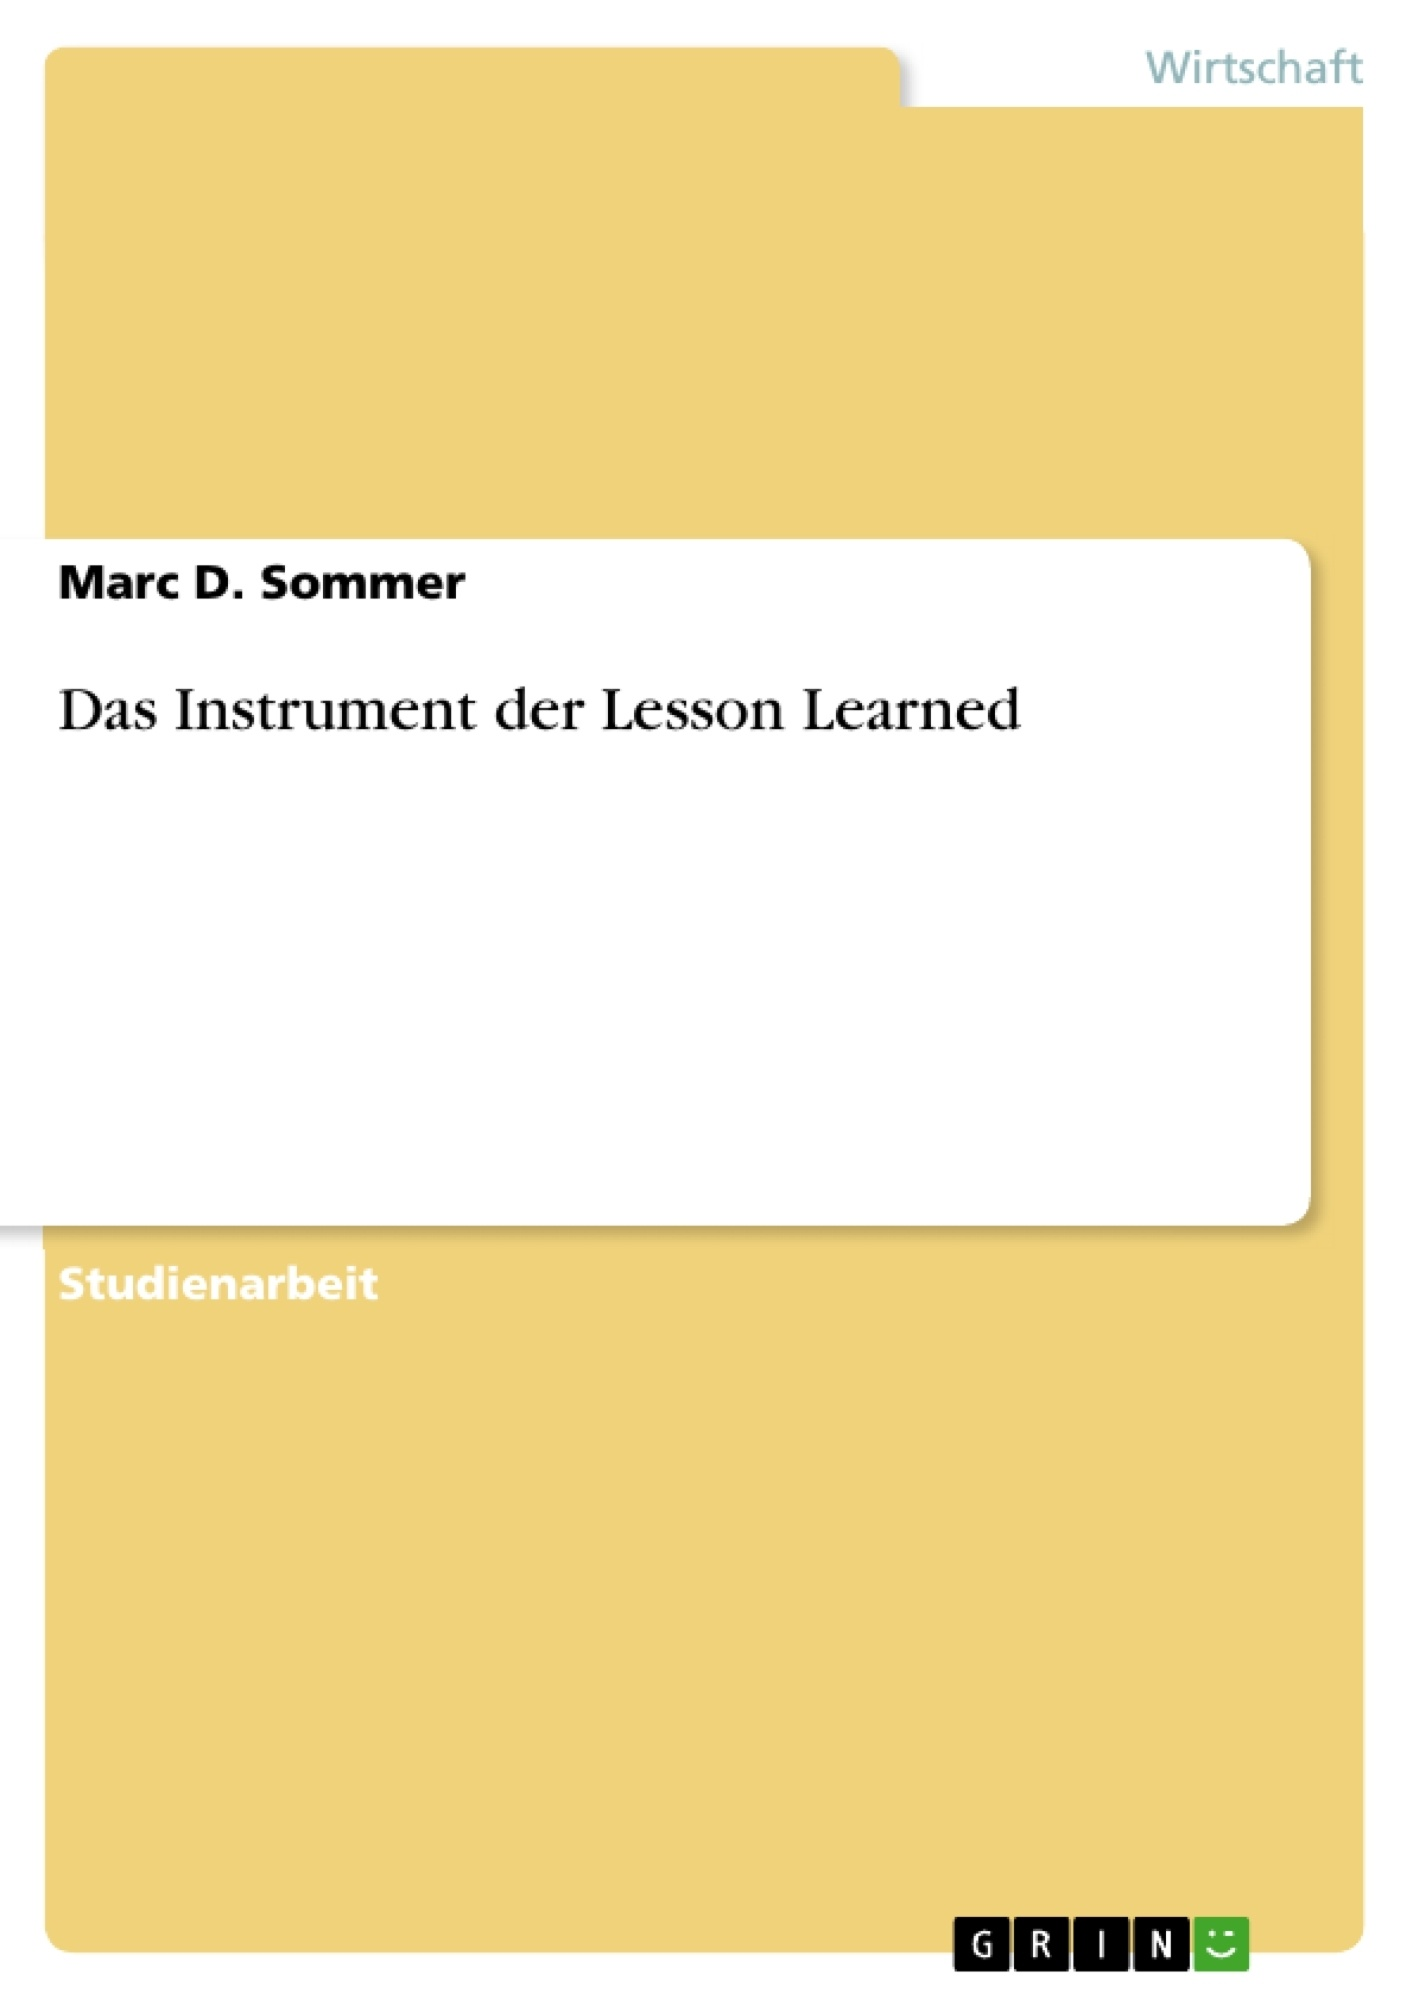 Titel: Das Instrument der Lesson Learned